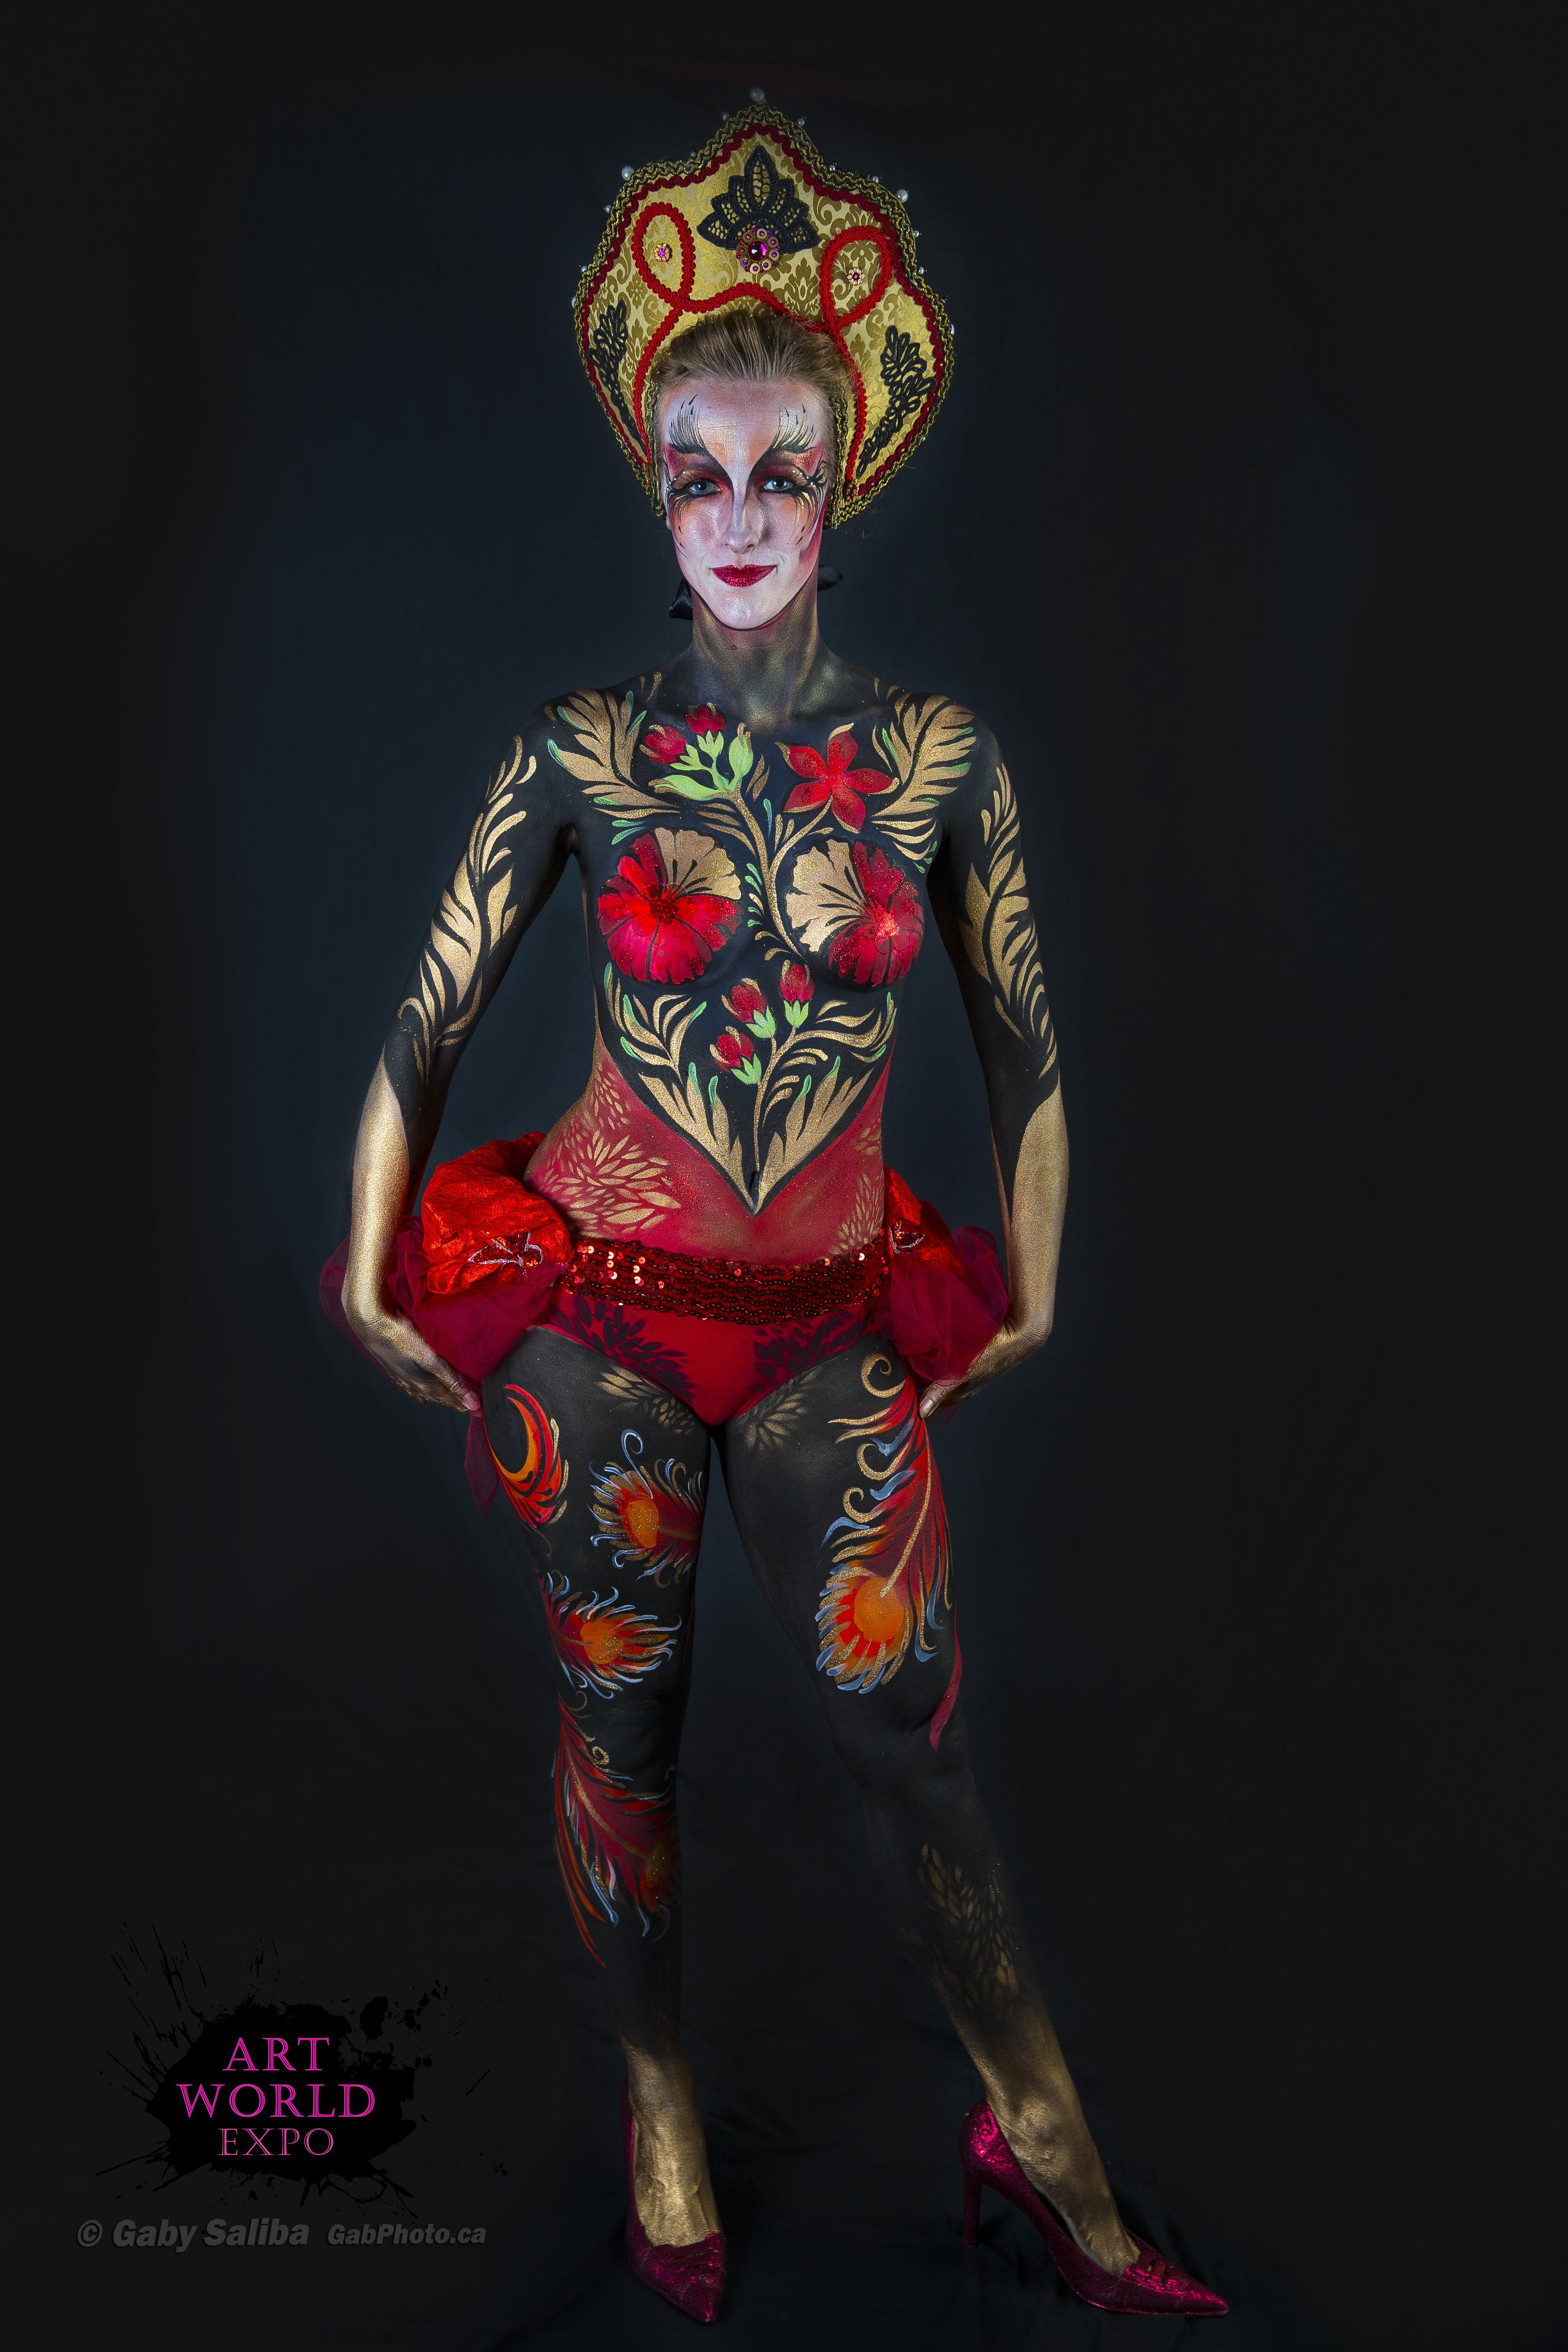 Festival Body Painting | ART BODY PAINTING